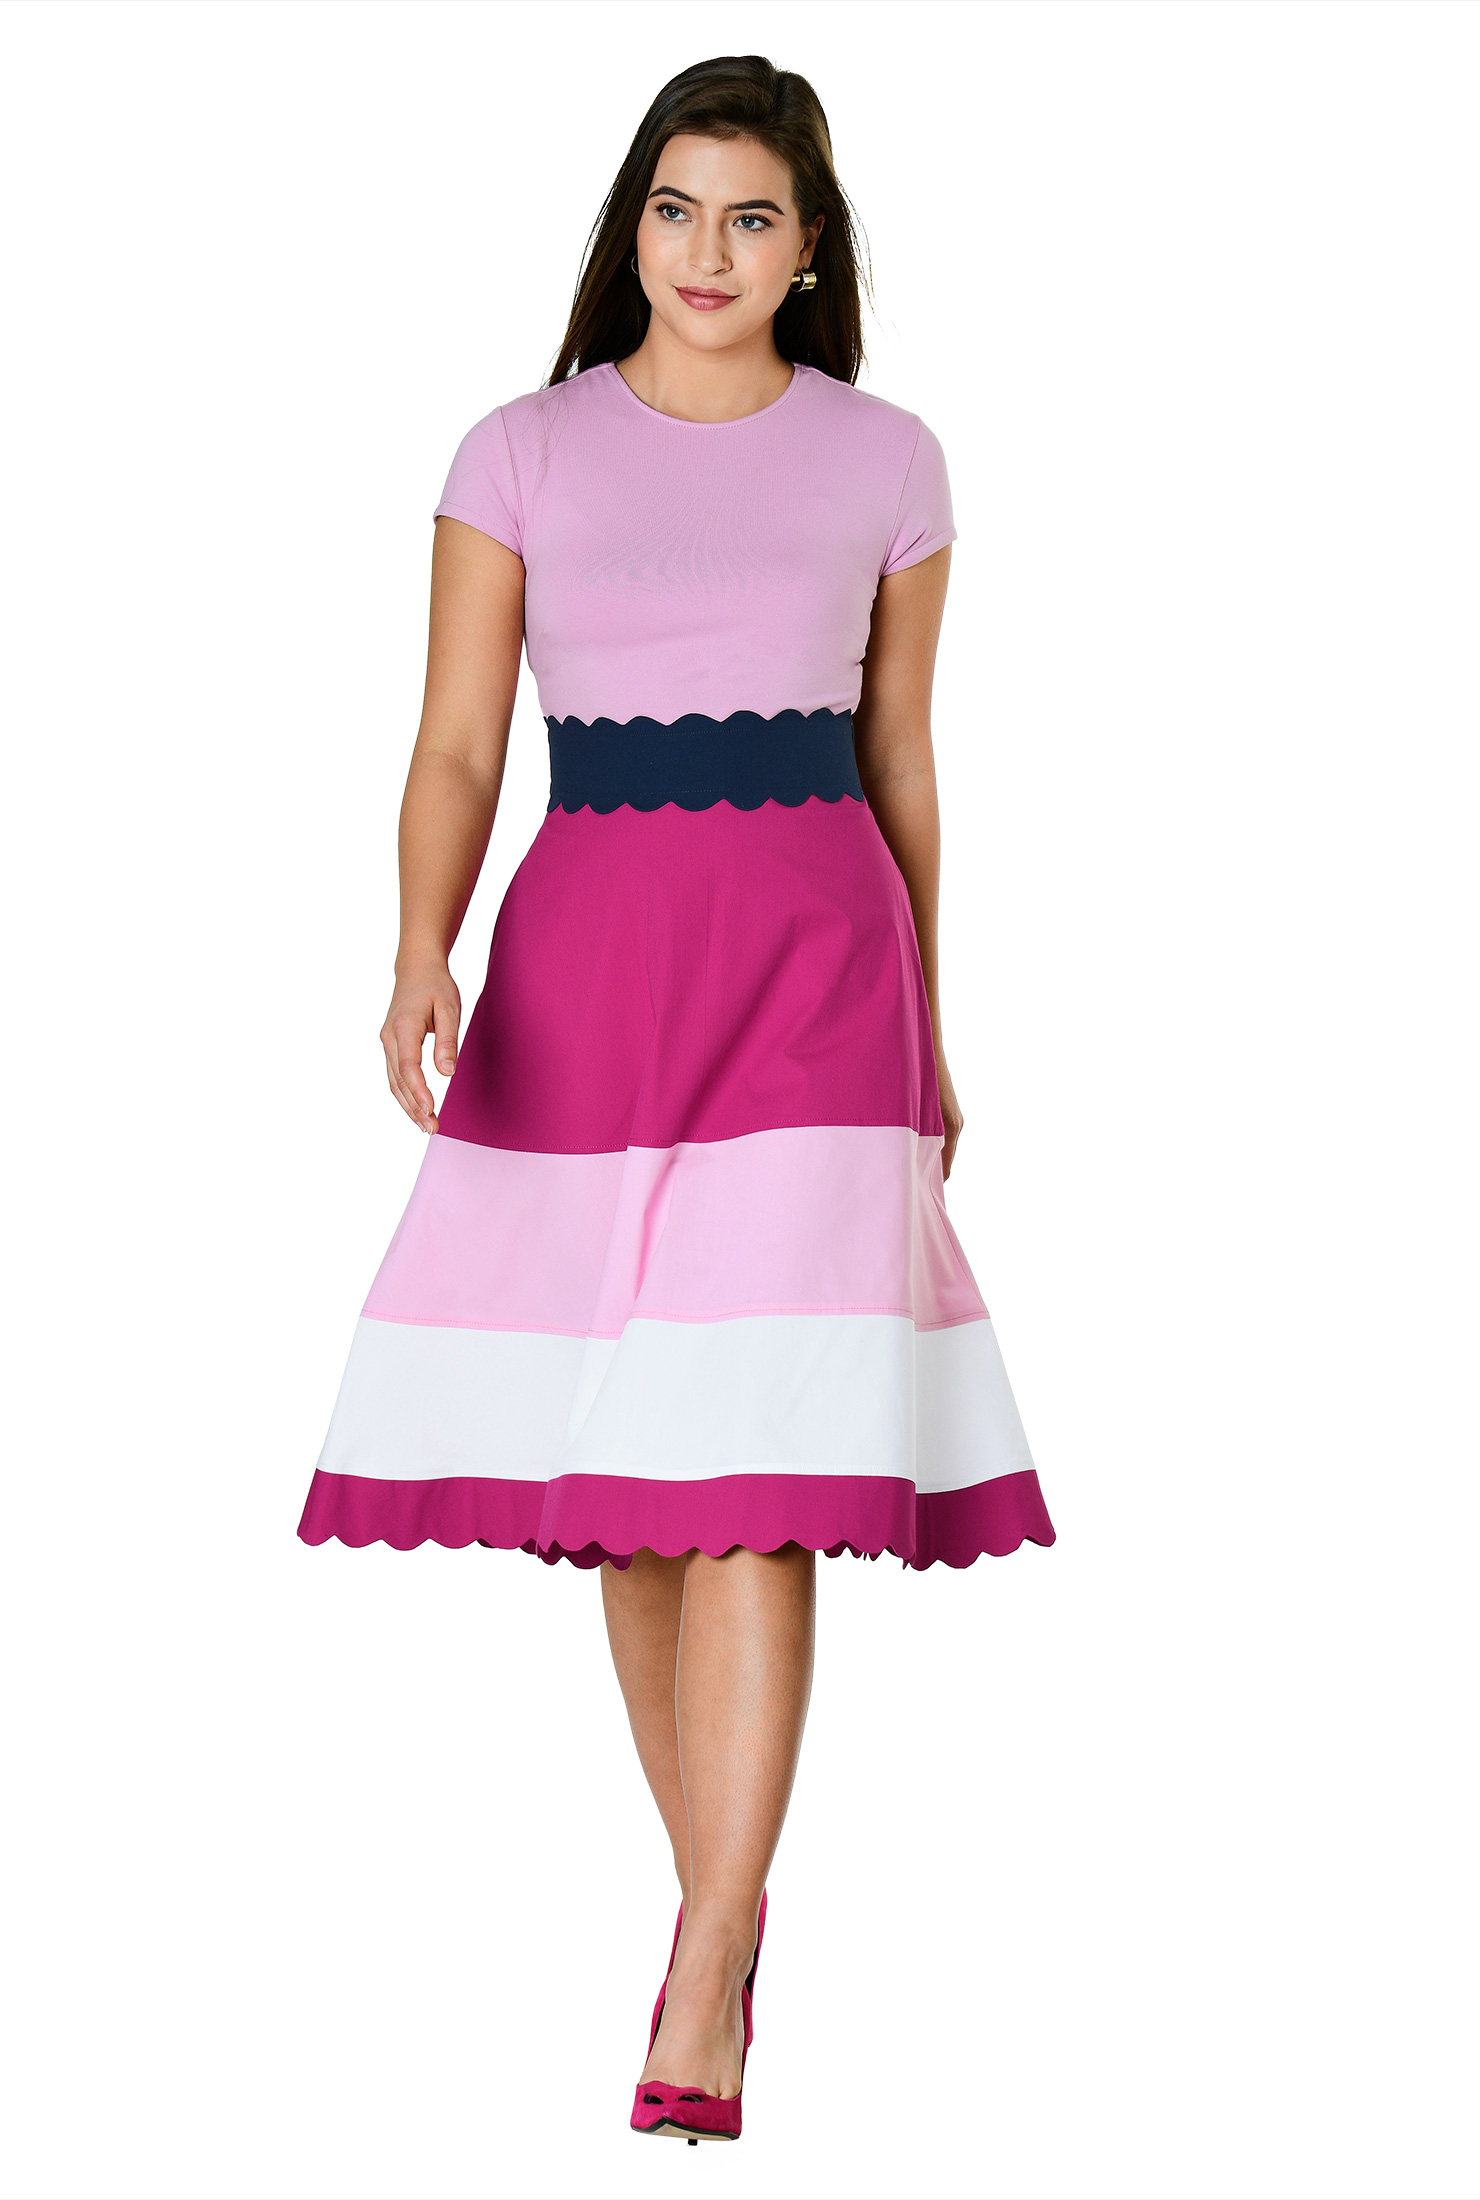 aa341a965822 Women s Fashion Clothing 0-36W and Custom